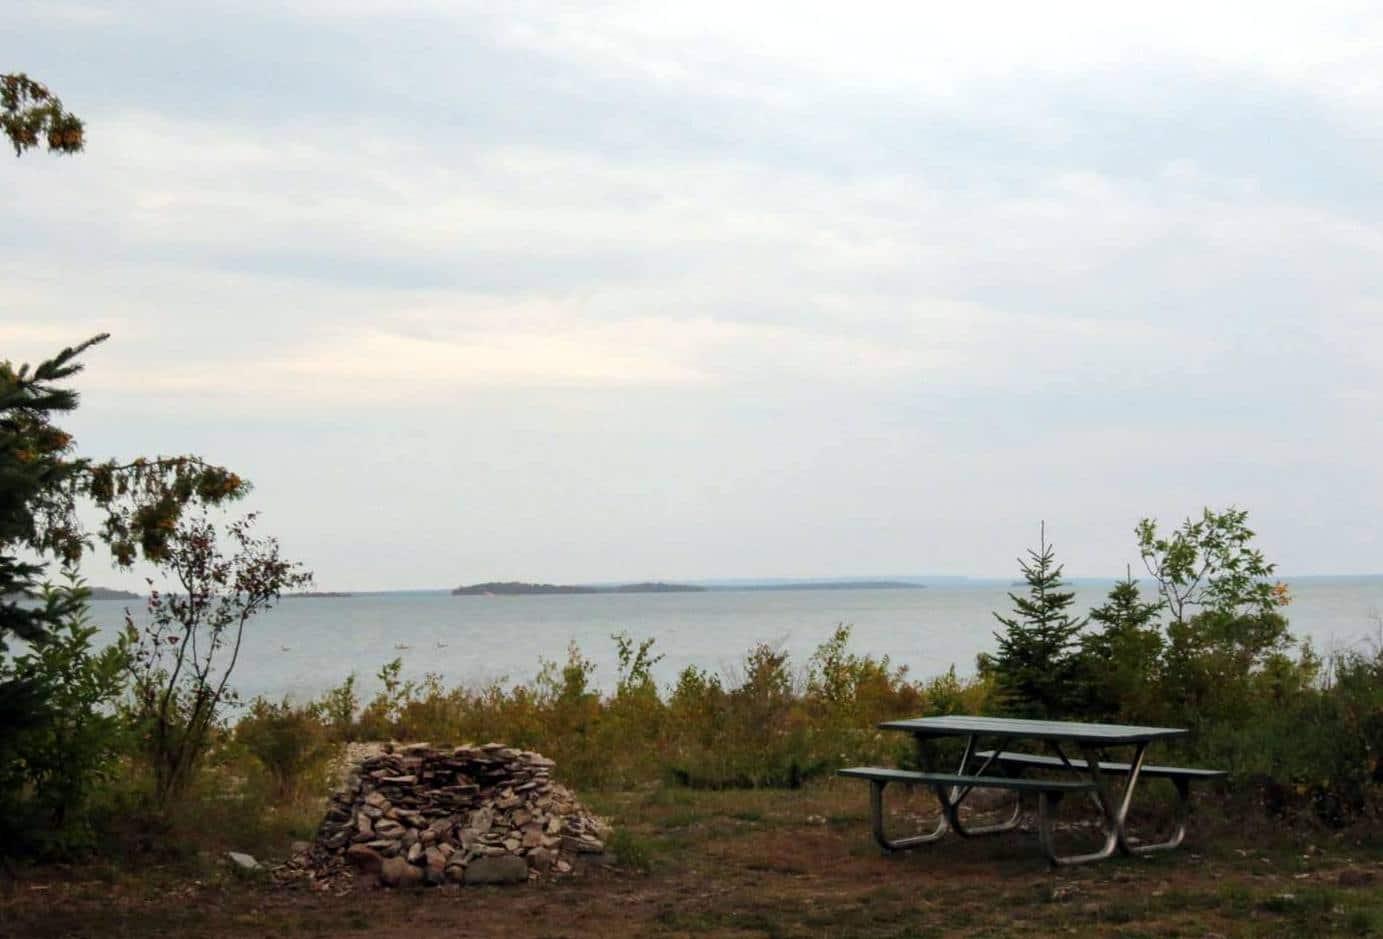 Drummond Island Township Park